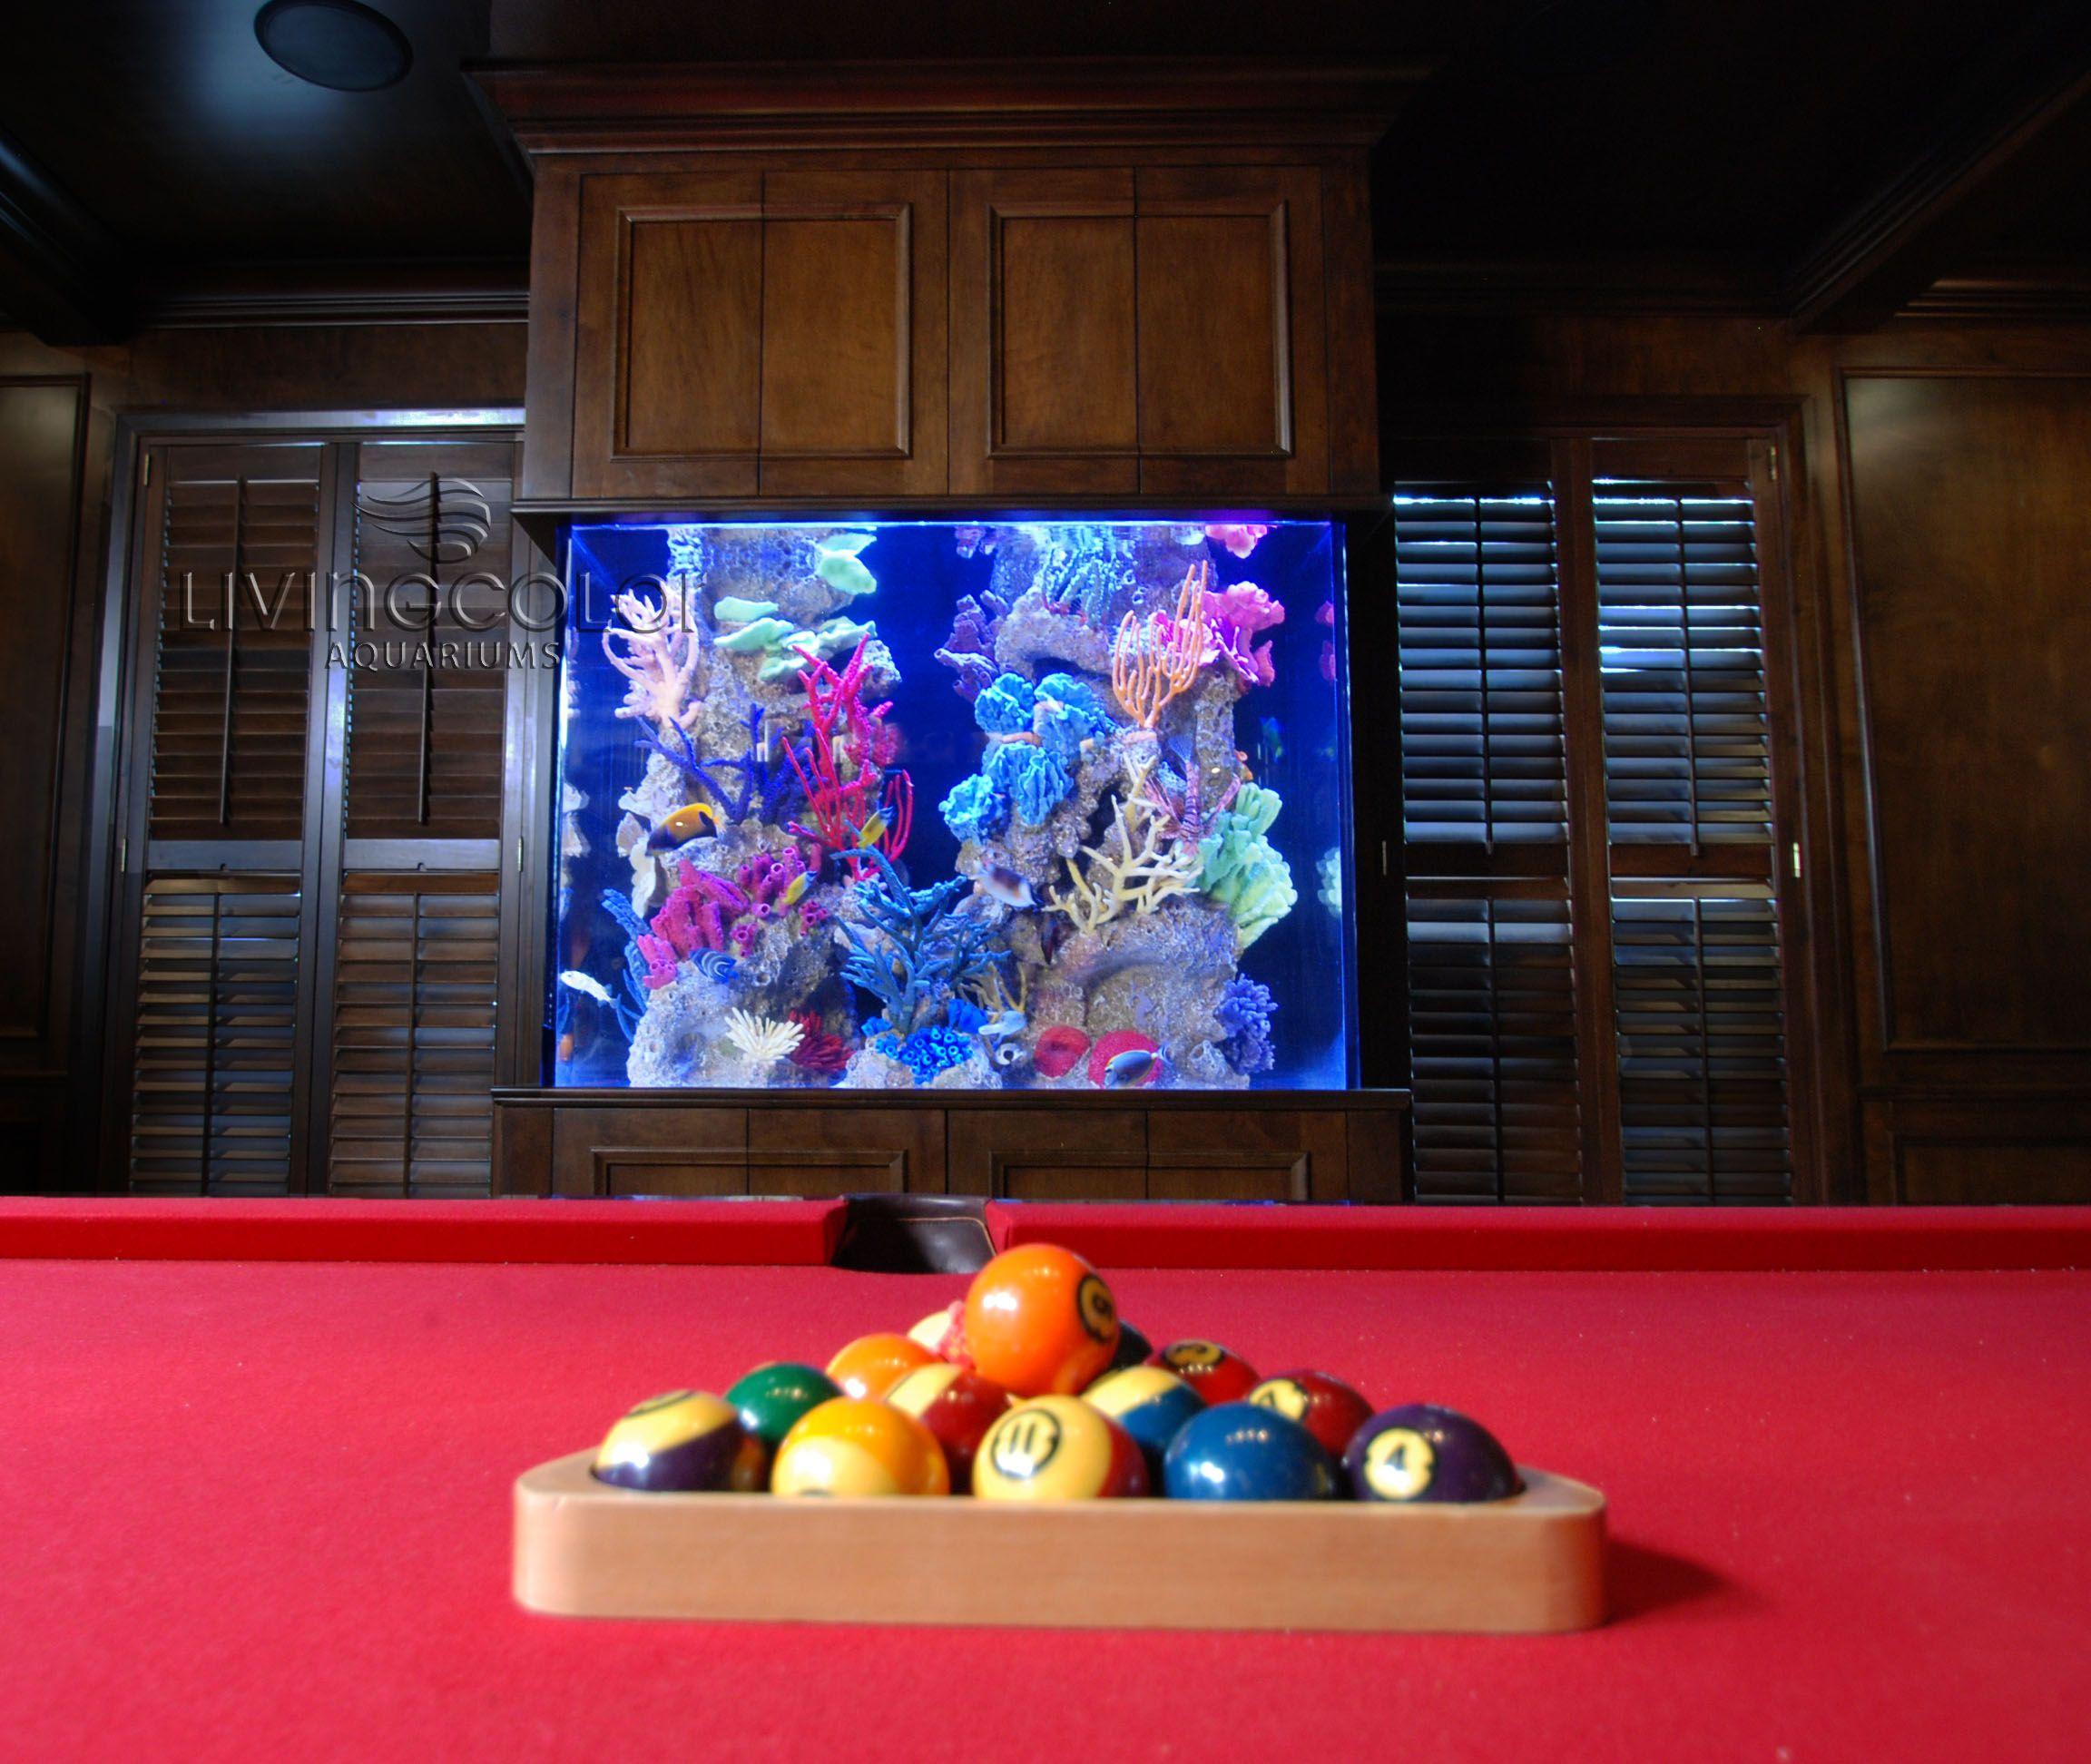 Fish tank acrylic - Custom Aquarium Living Color Acrylic Tank Manufacturing